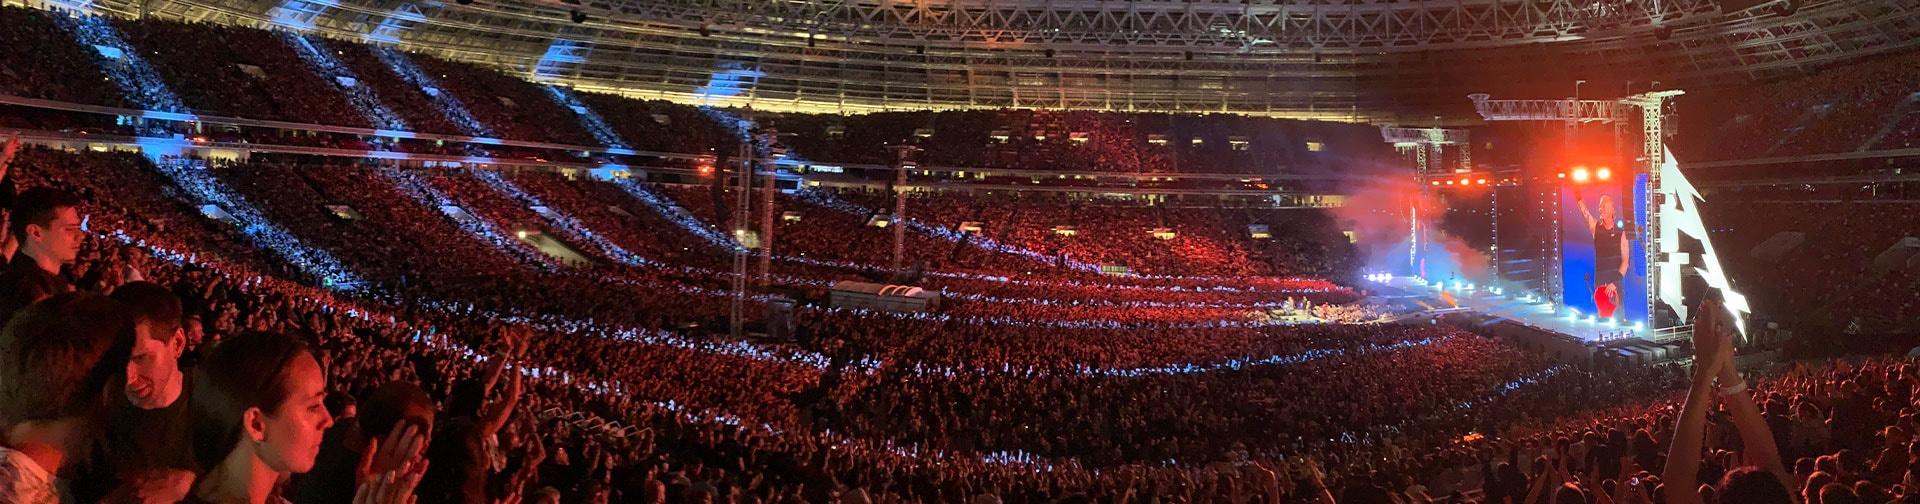 Metallica at Luzhniki Stadium in Moscow, Russia on July 21, 2019